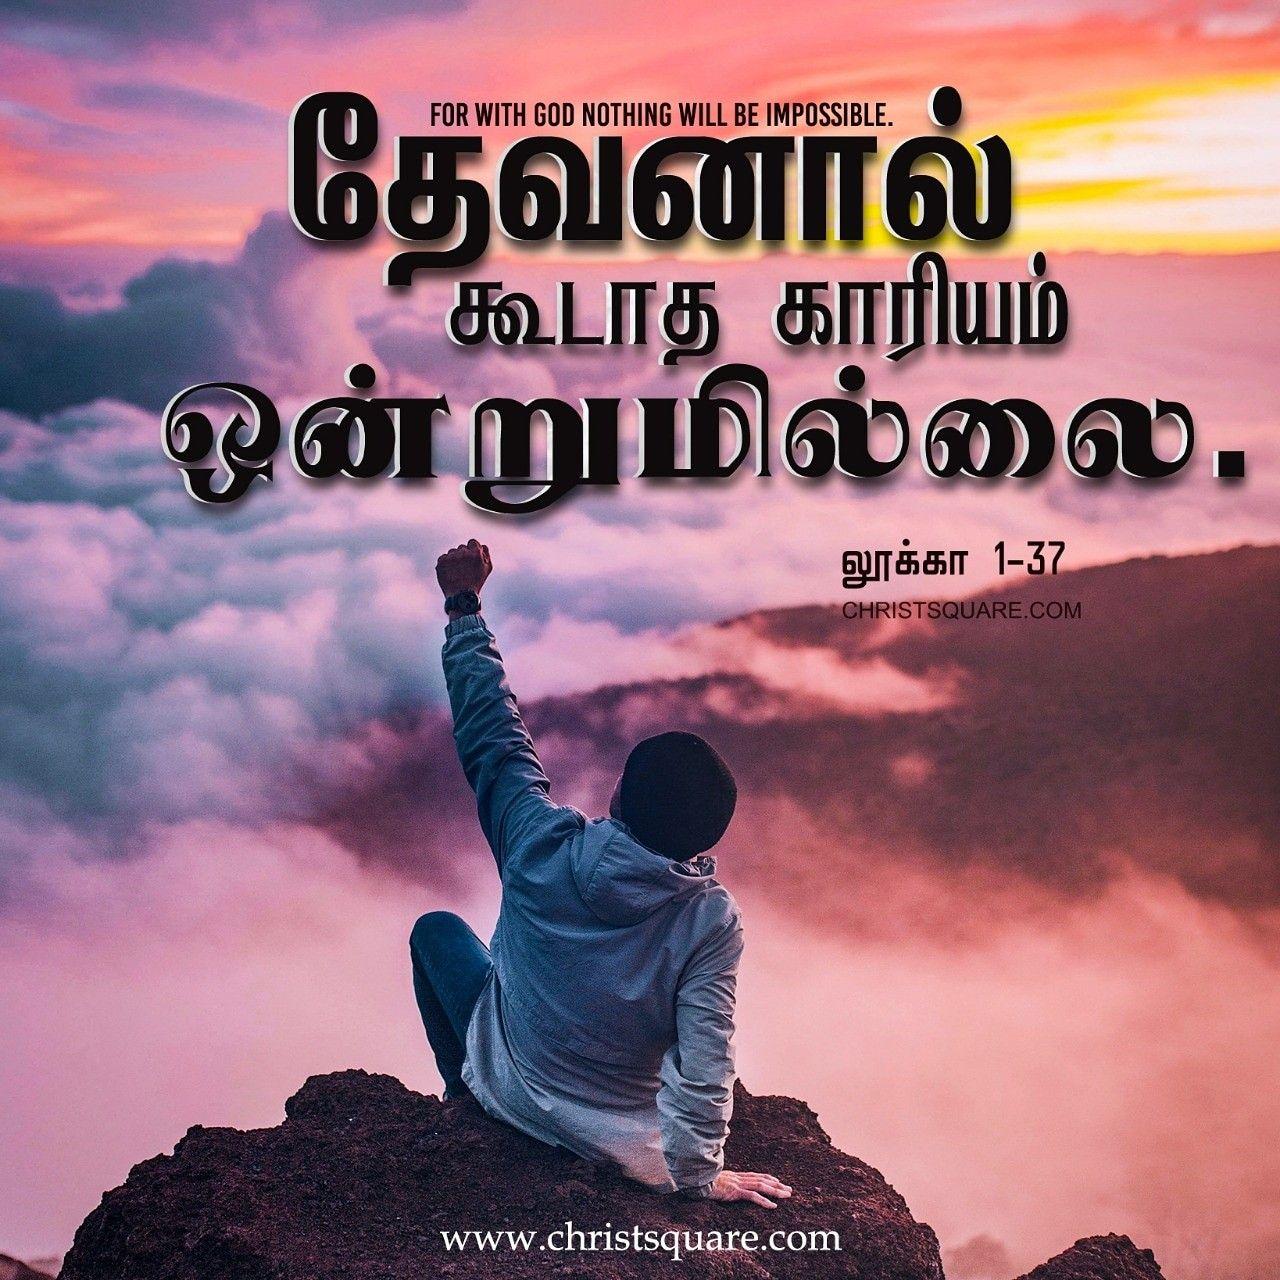 Tamil Christian Whatsapp Status Tamil Christian Whatsapp Dp Wallpaper Tamil Christian Wallpaper Hd Tamil Bible Words Bible Words In Tamil Bible Words Images